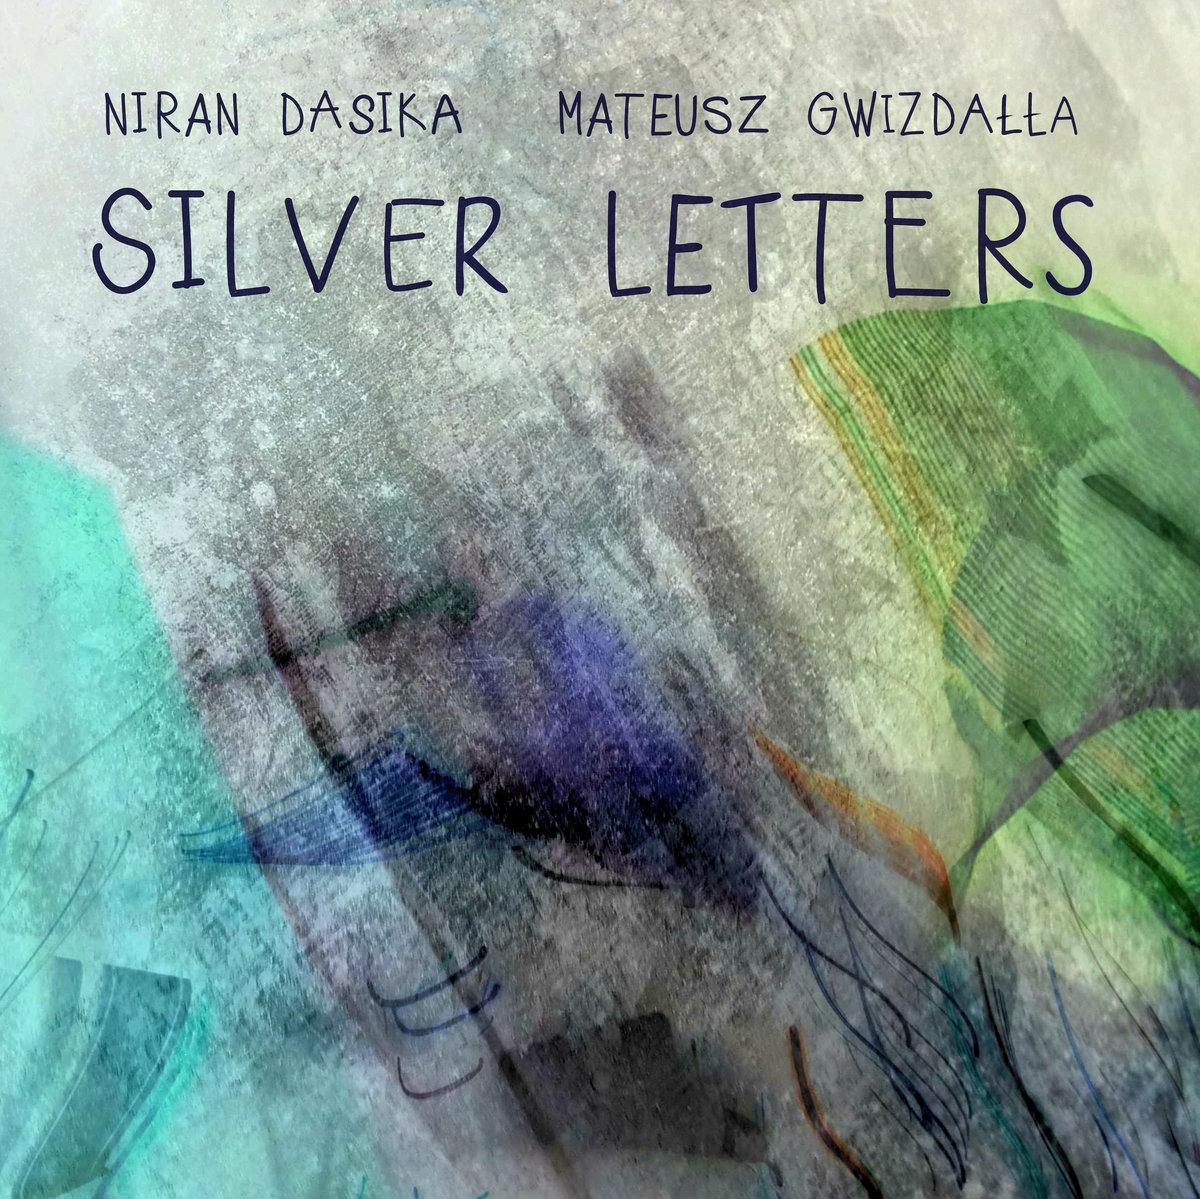 Niran Dasika, Mateusz Gwizdałła - Silver Letters (2016)